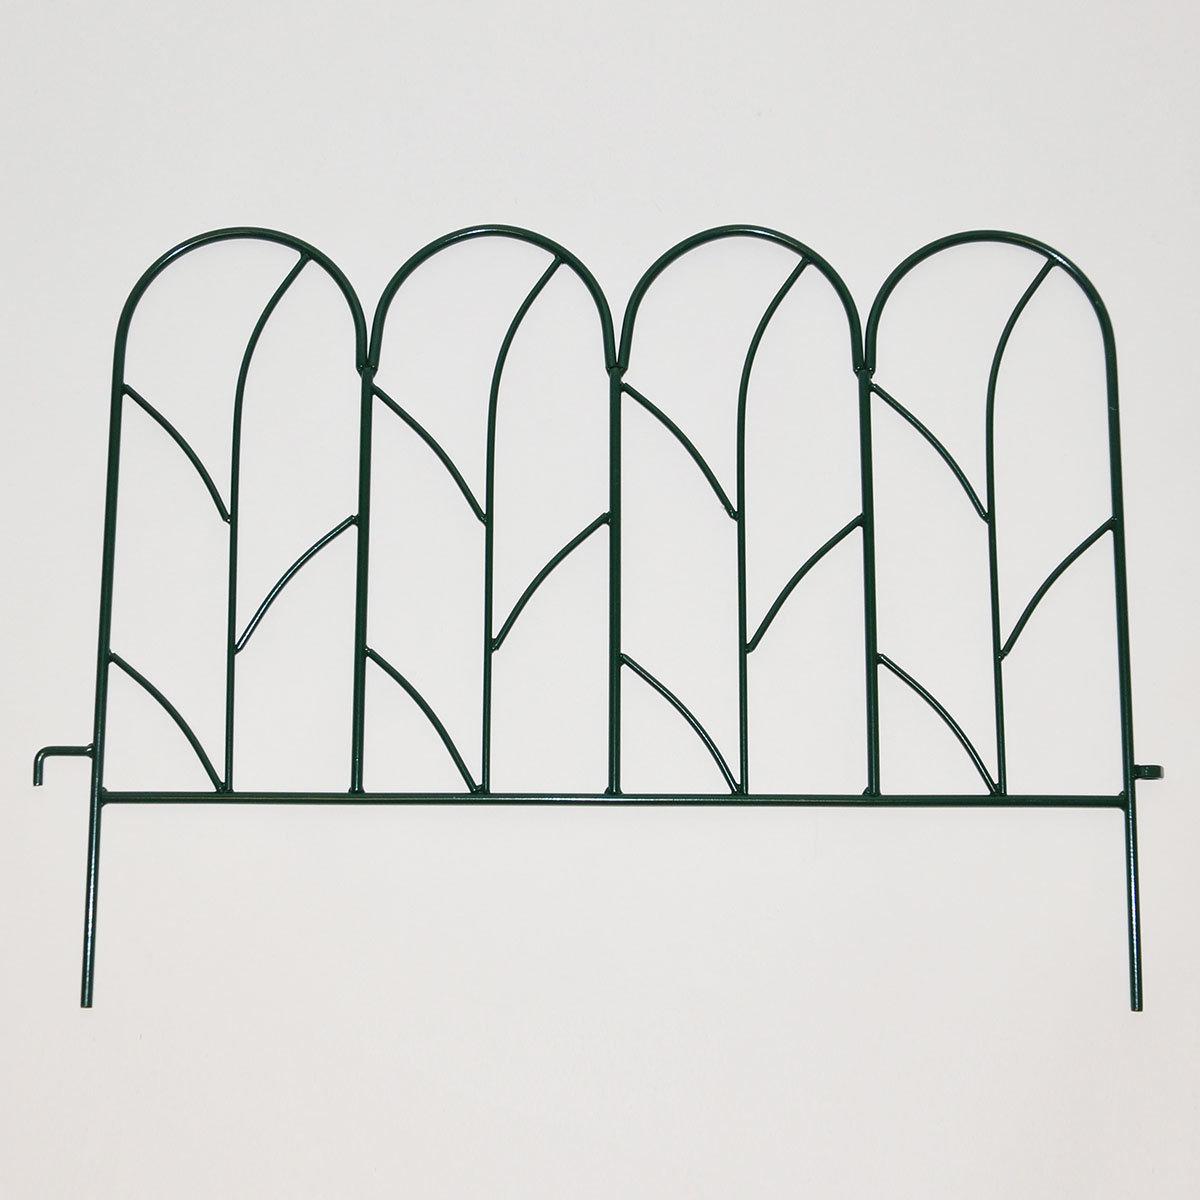 Beetzaun Liane, 4er-Set, oxford-grün